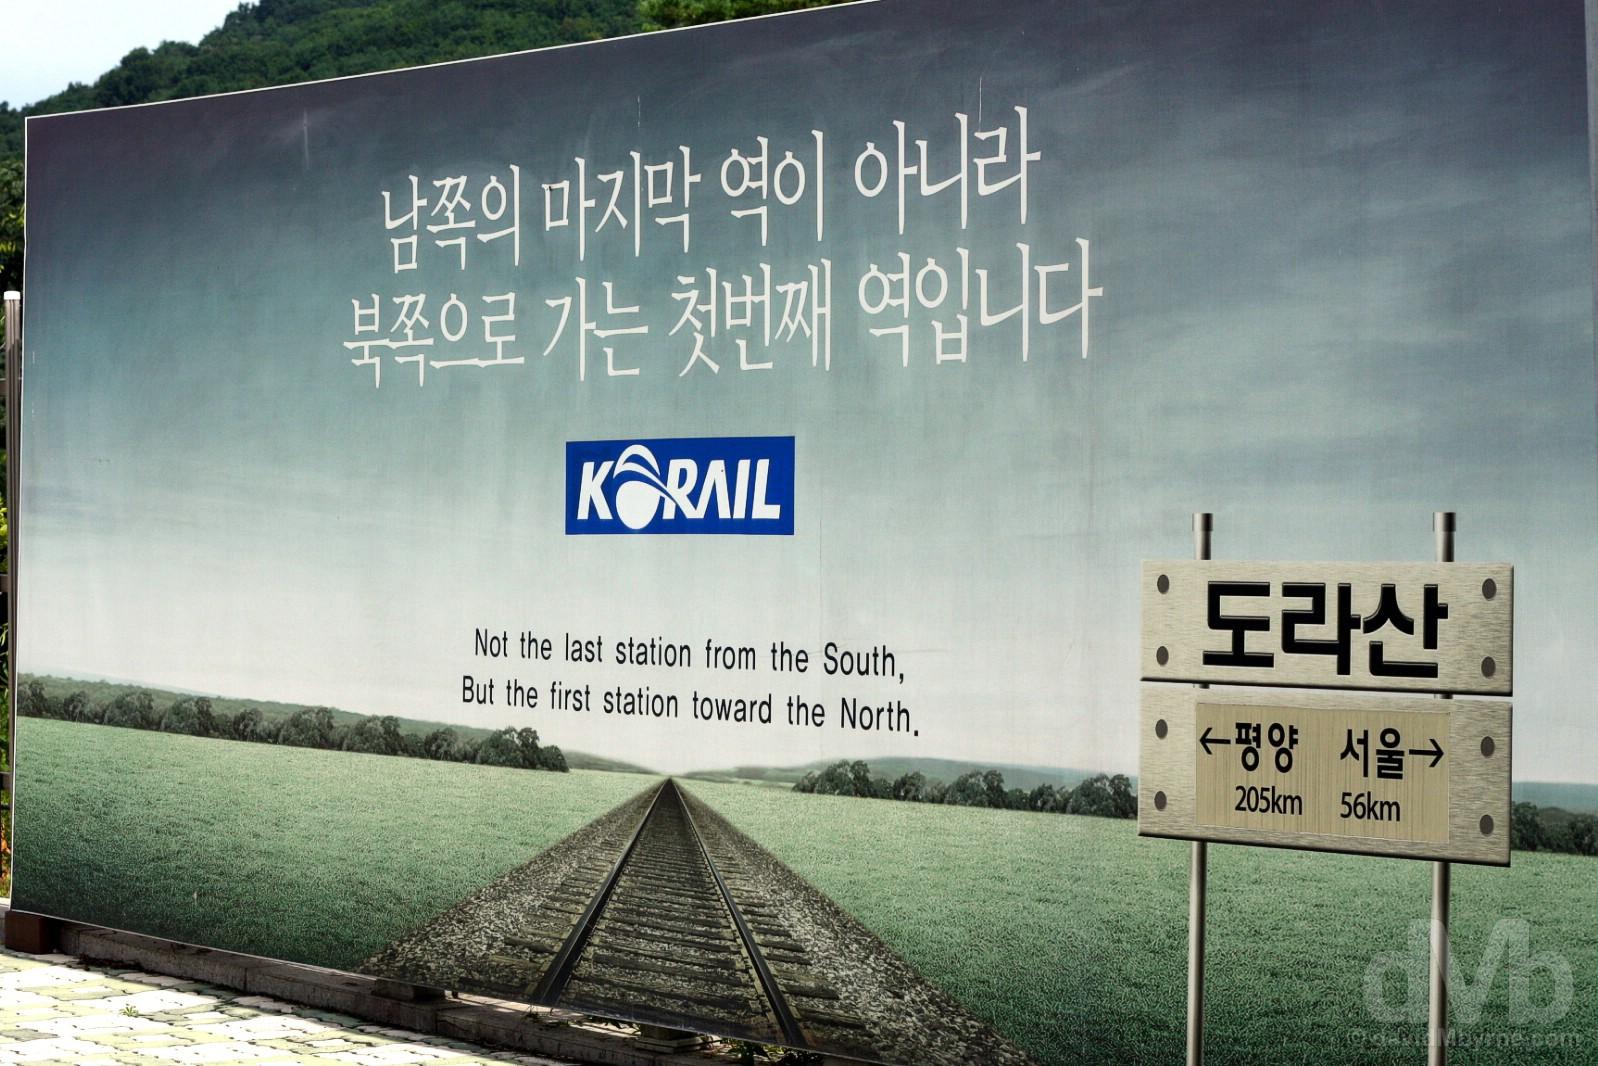 The first station toward the North. 205km to Pyeongyang, North Korea. Dorasan Station, South Korea. August 21, 2009.